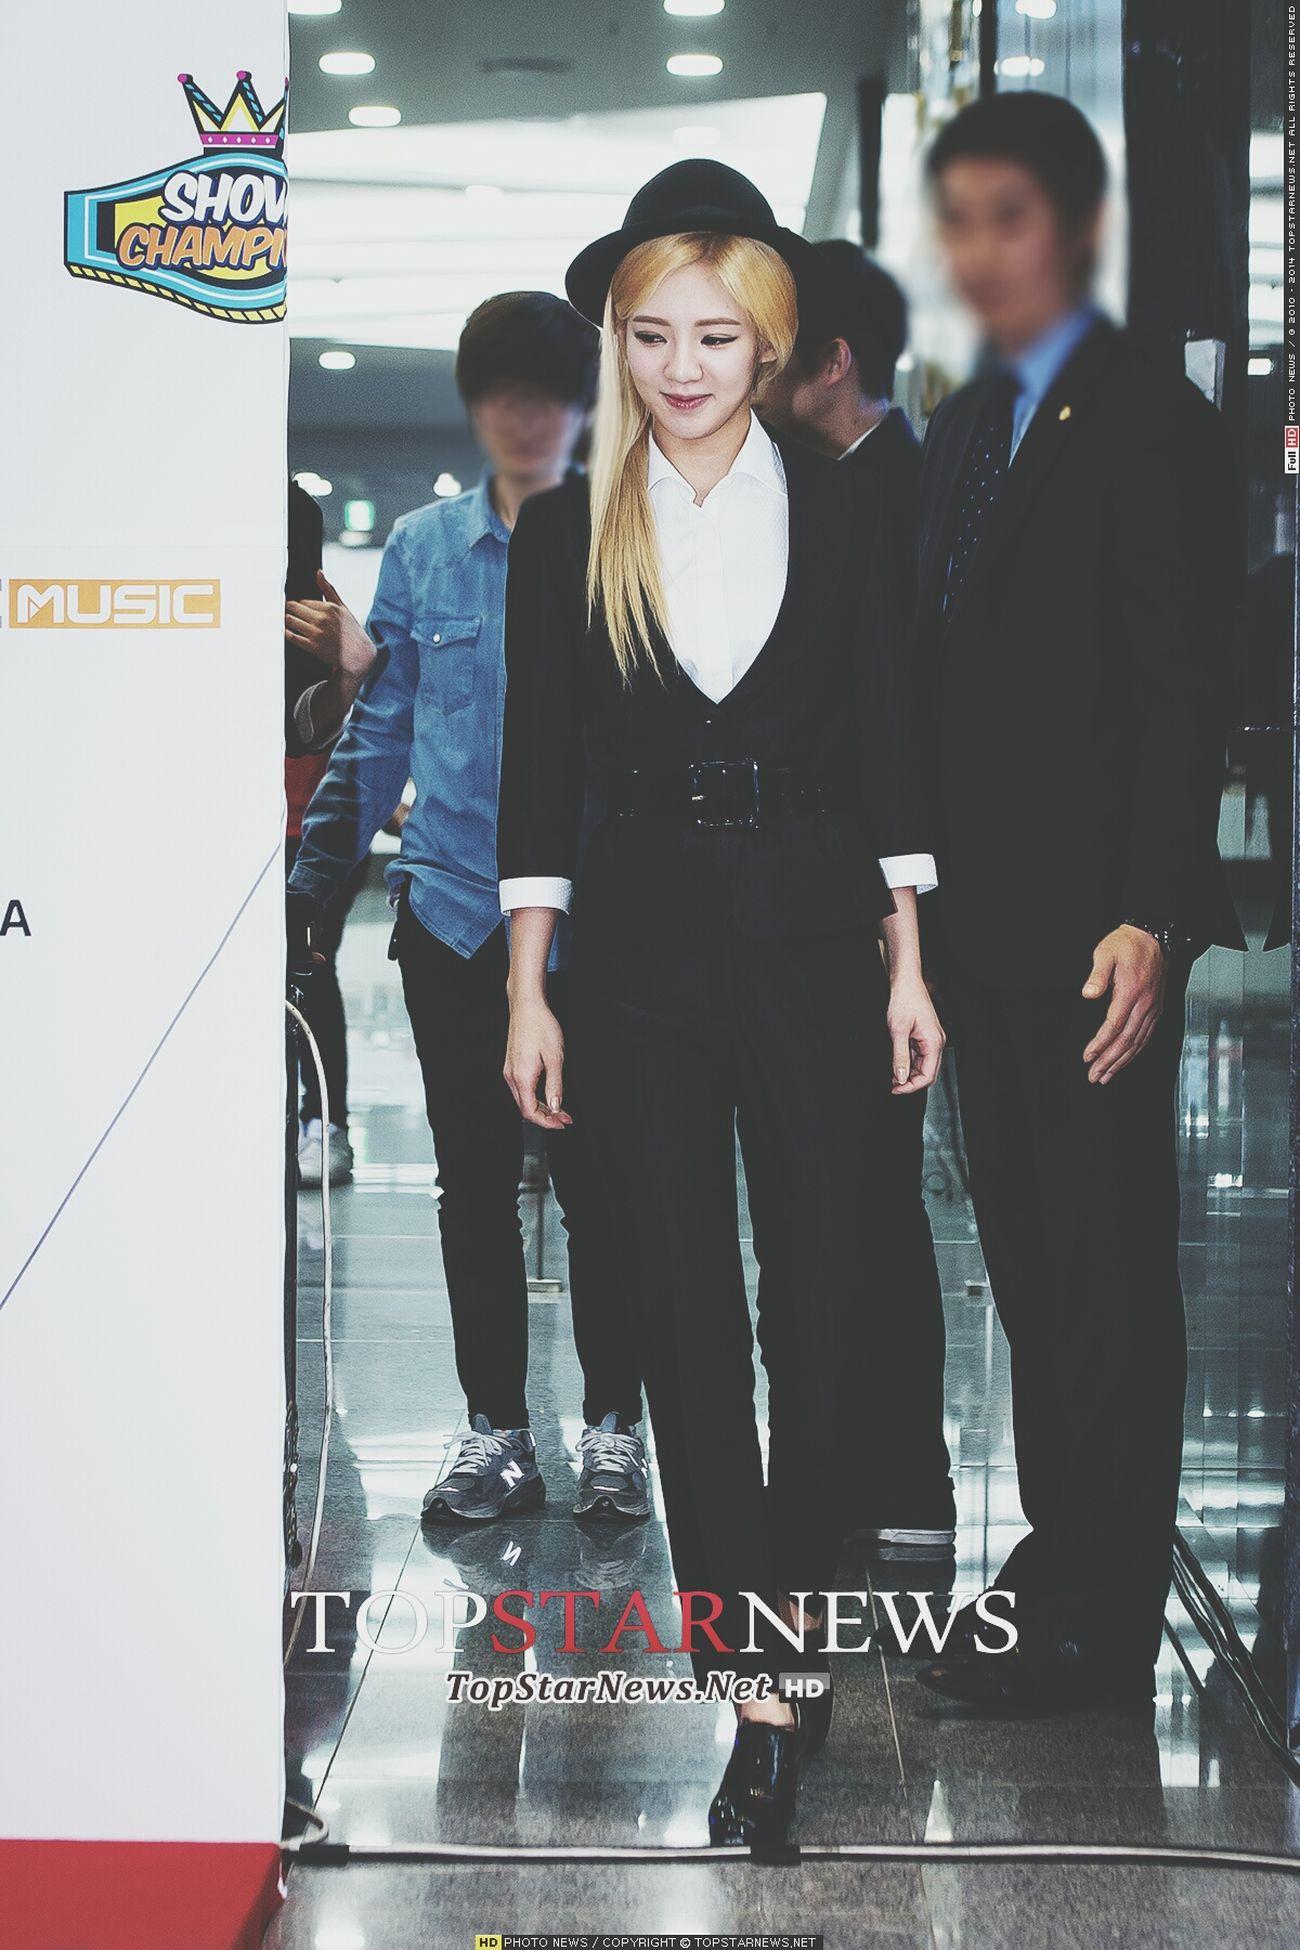 [UPDATE] 140319 SNSD @ MBC Champion 100th Special Red Carpet -[©TopStarNews] Hyoyeon SNSD GirlsGeneration Soshi